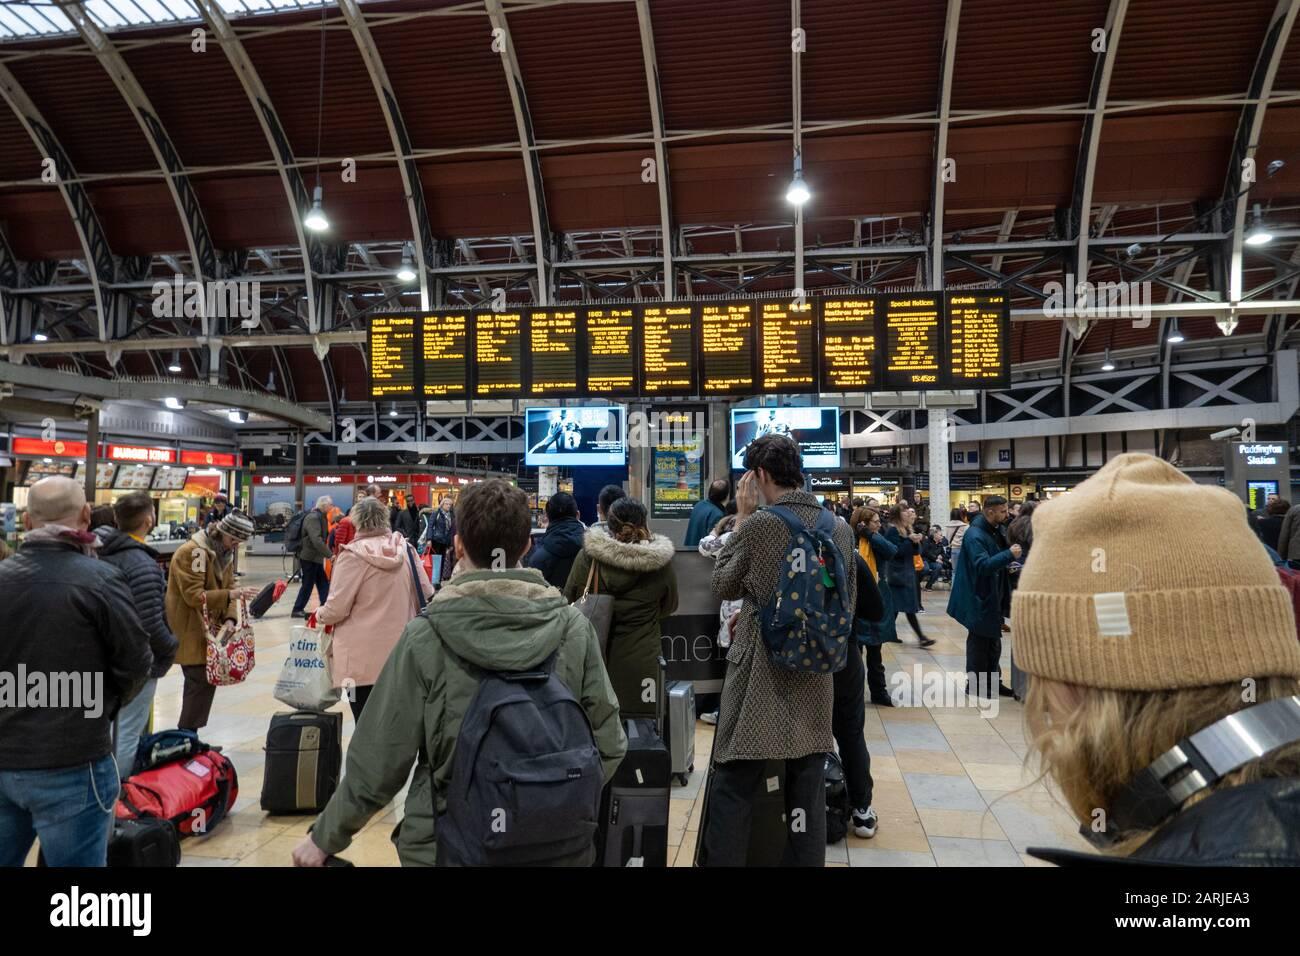 Passengers waiting at Train Departure board, Paddington Station, London, UK Stock Photo